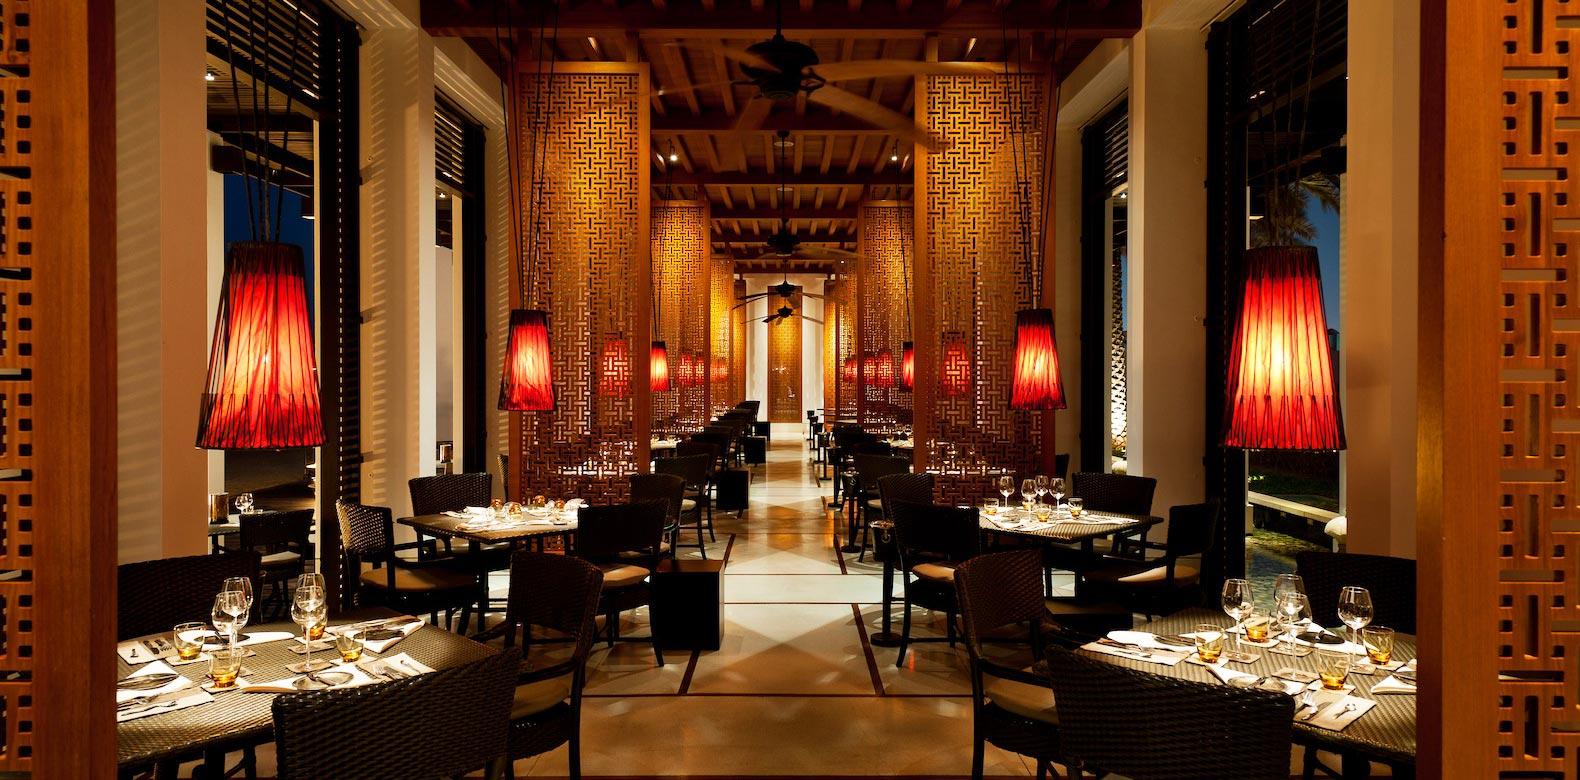 CMU-Dining-The-Beach-Restaurant-Interior.jpg